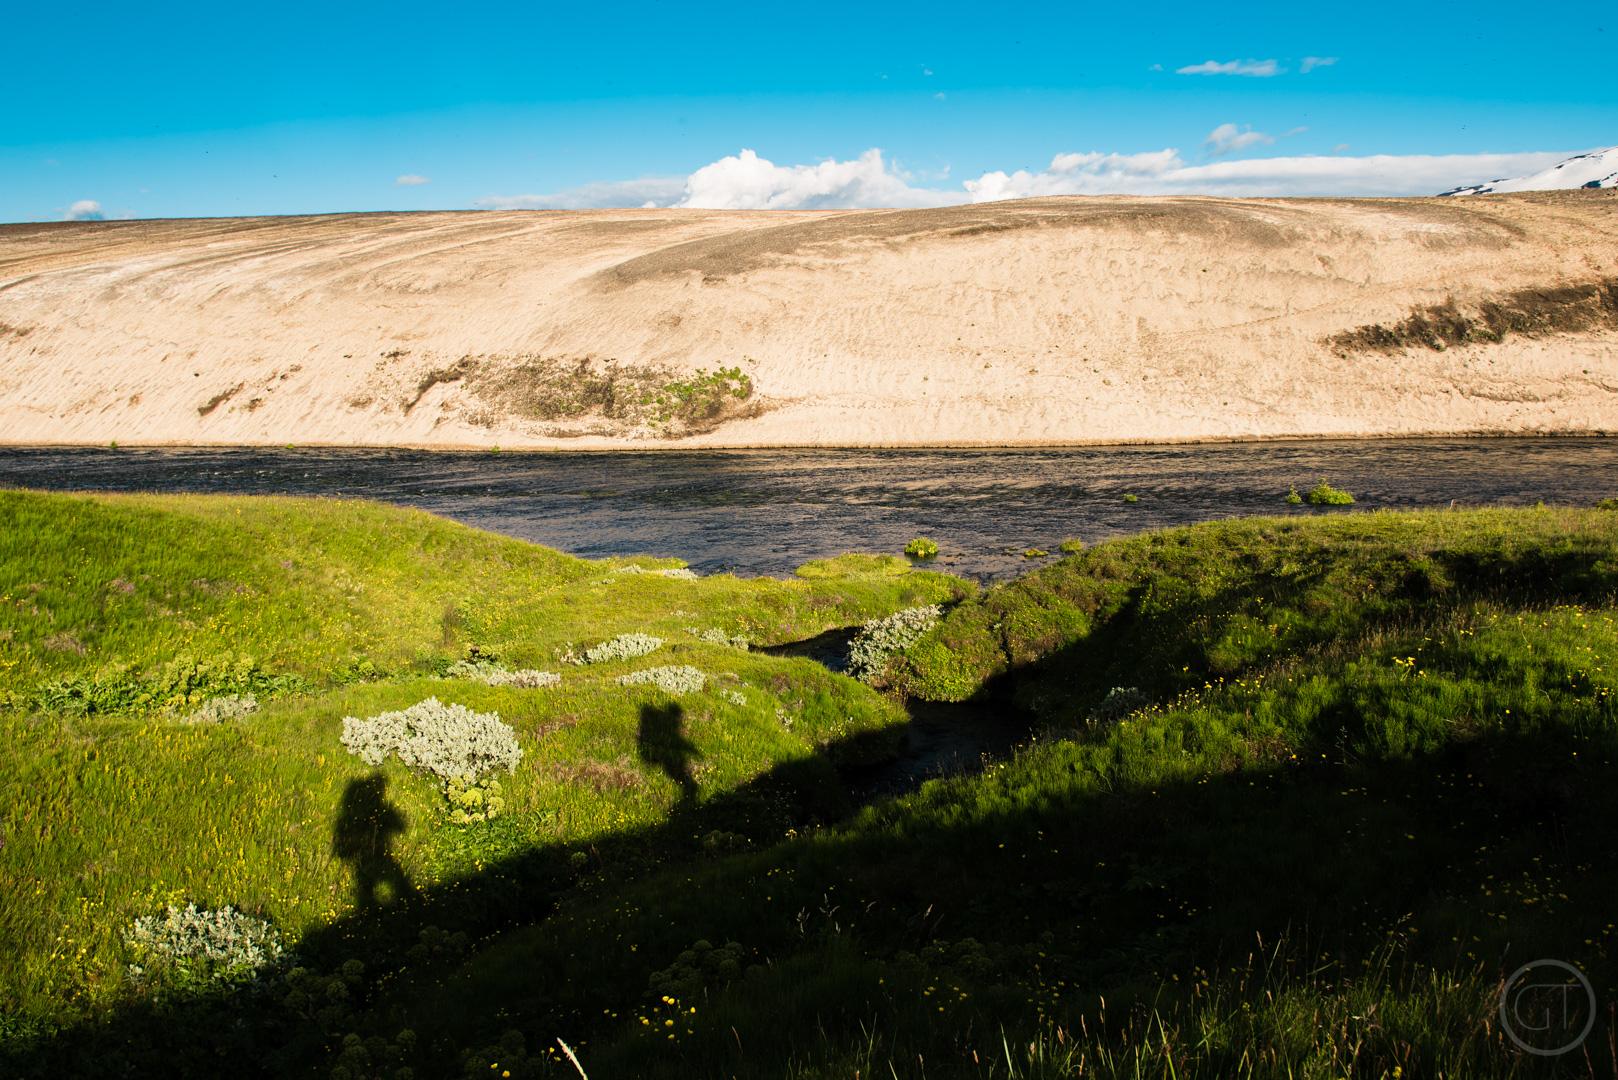 Iceland-gustav-thuesen-photography-landscape-nature-københavn-danmark-adventure-outdoor-lifestyle-9.jpg